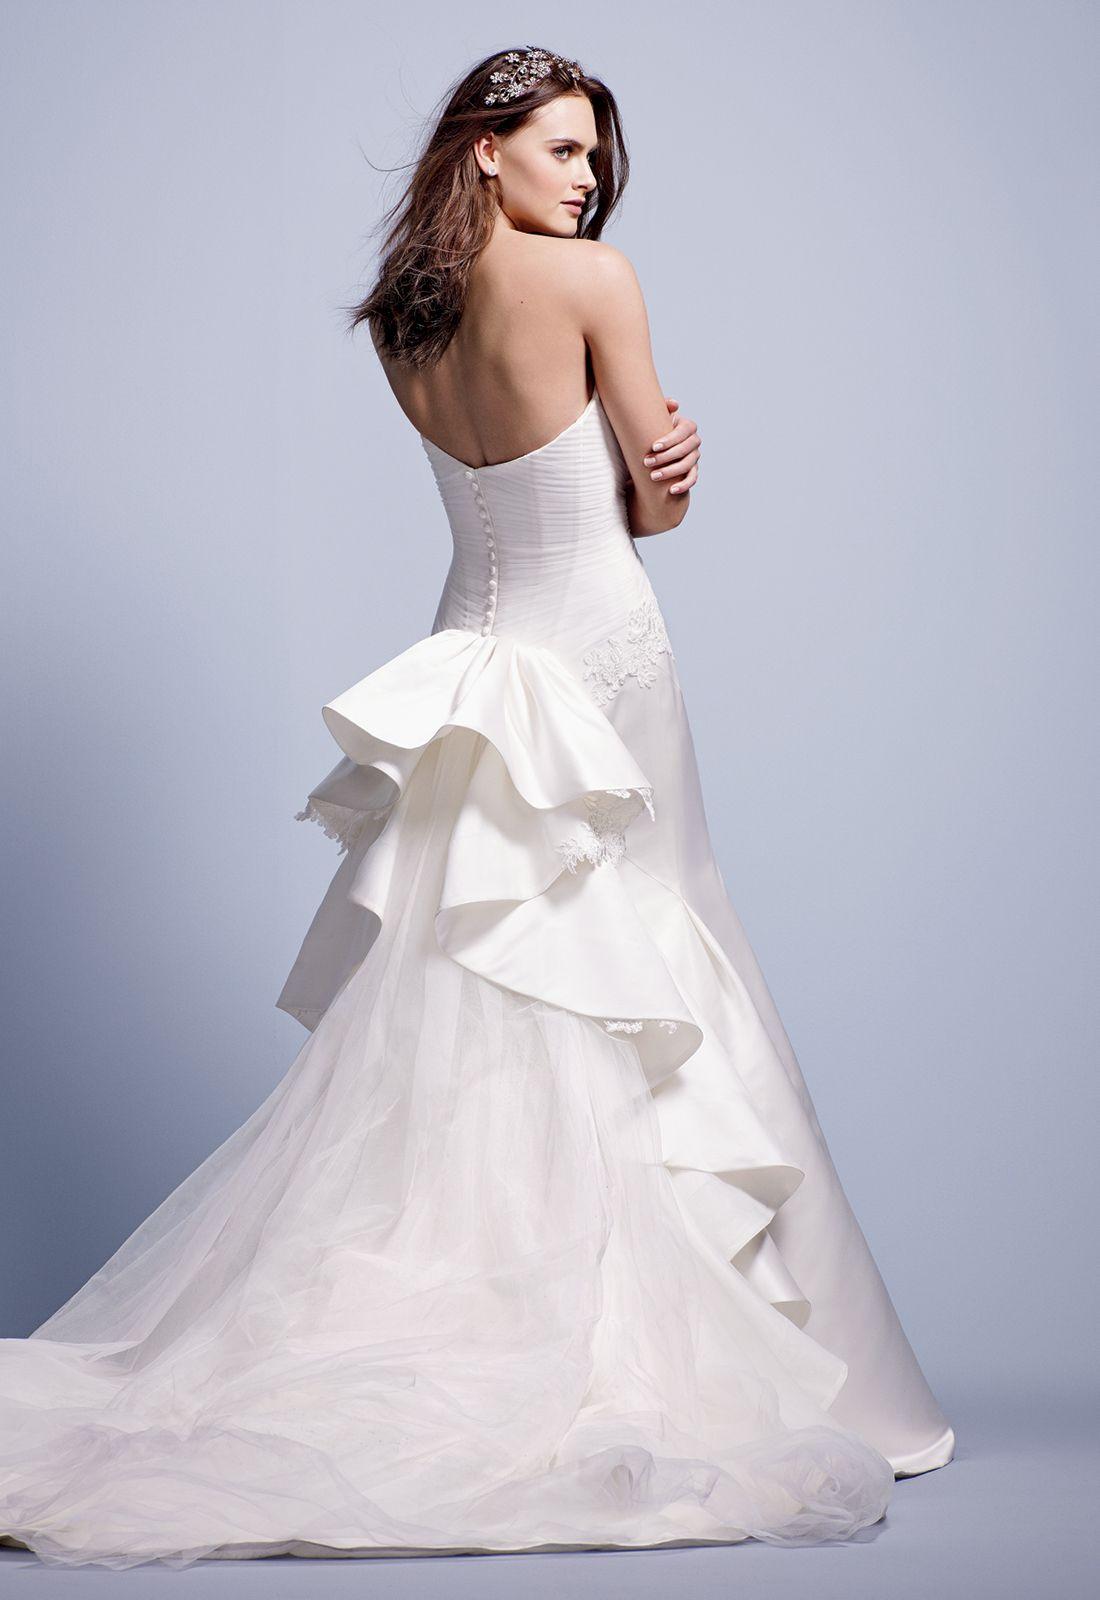 Pin By David S Bridal On Black White Wedding Decor Wedding Dress With Veil Wedding Dress Inspiration Wedding Dresses [ 1600 x 1100 Pixel ]